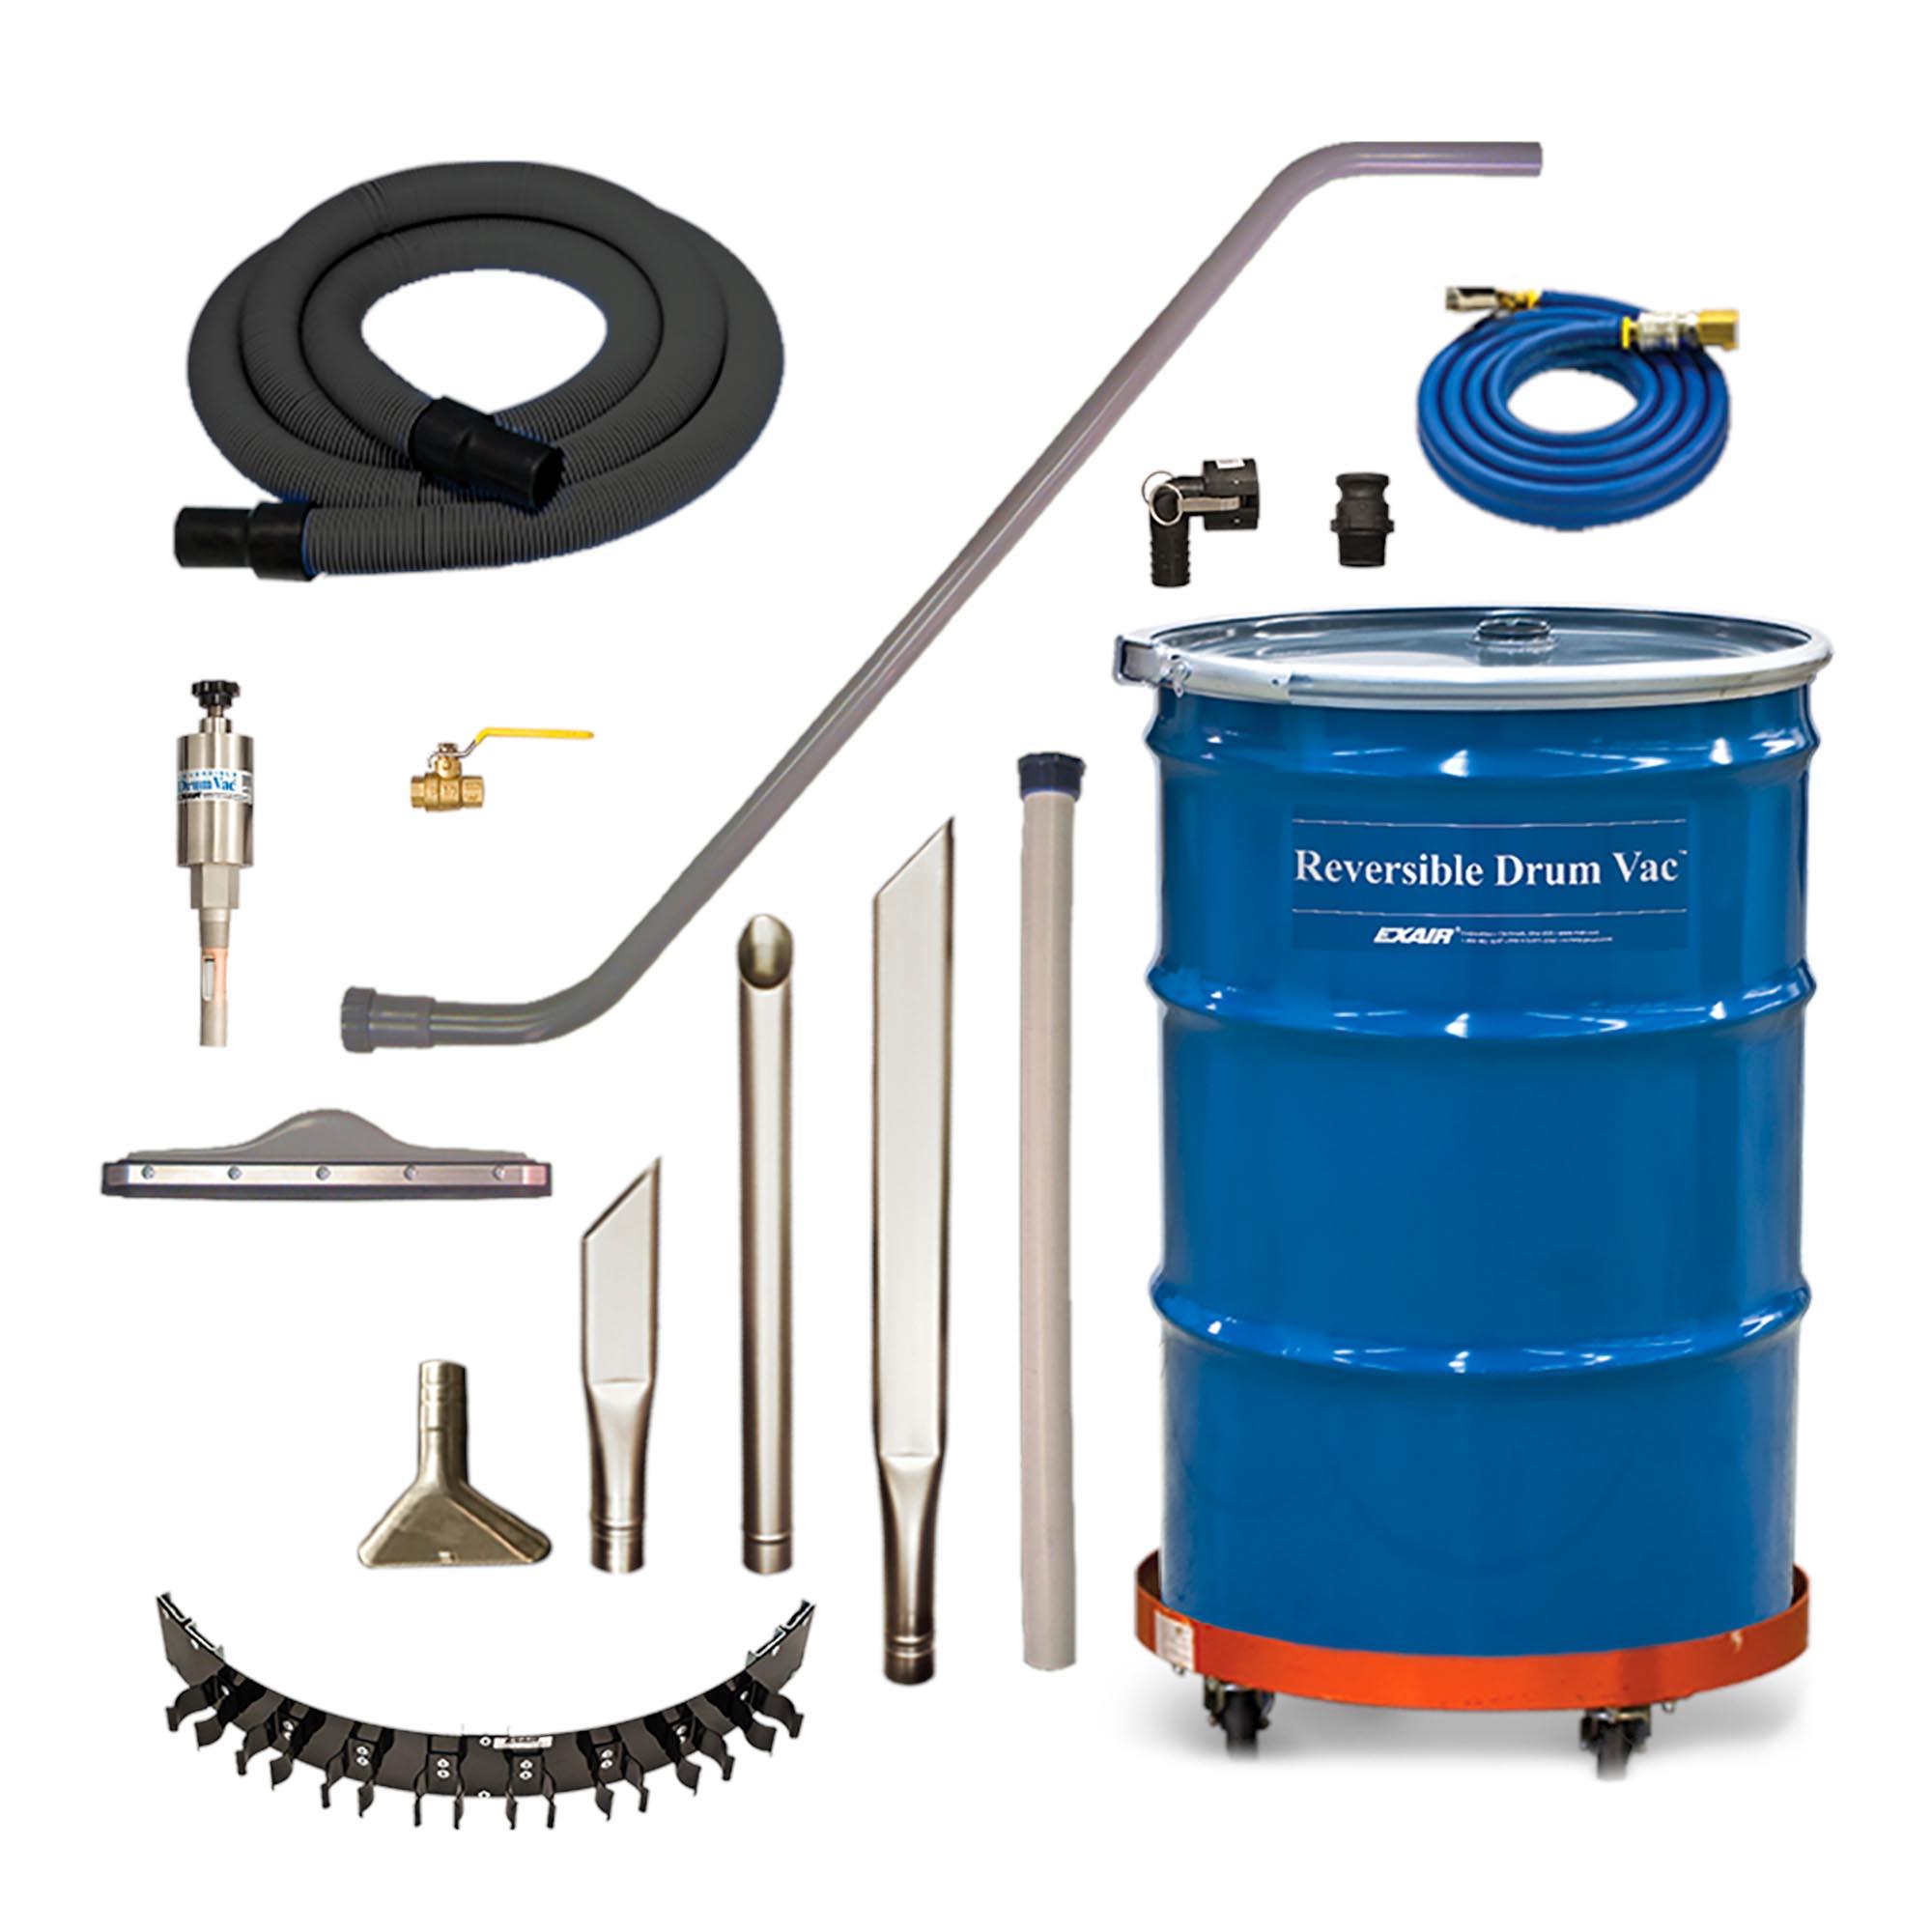 Model 6396 55 Gallon Premium Reversible Drum Vac System